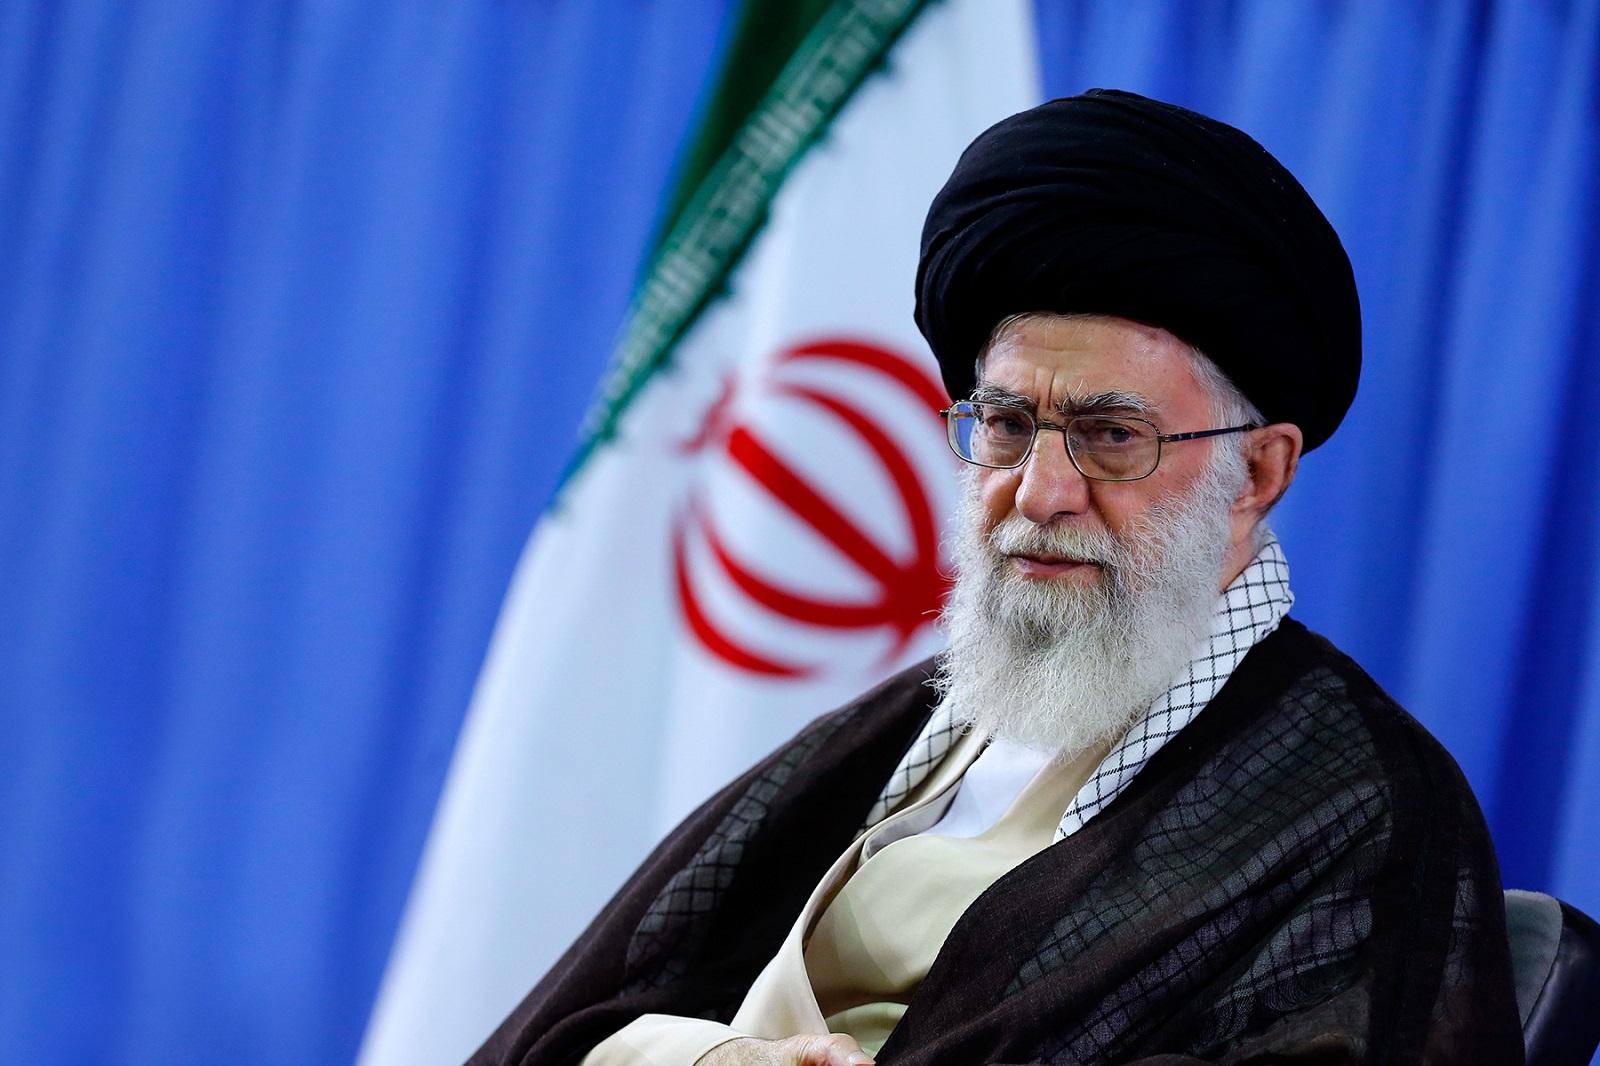 Photo of Leader of the Islamic Ummah and Oppressed Imam Ayatollah Sayyed Ali Khamenei Praises Role of Martyrs in Promoting Spirituality among People